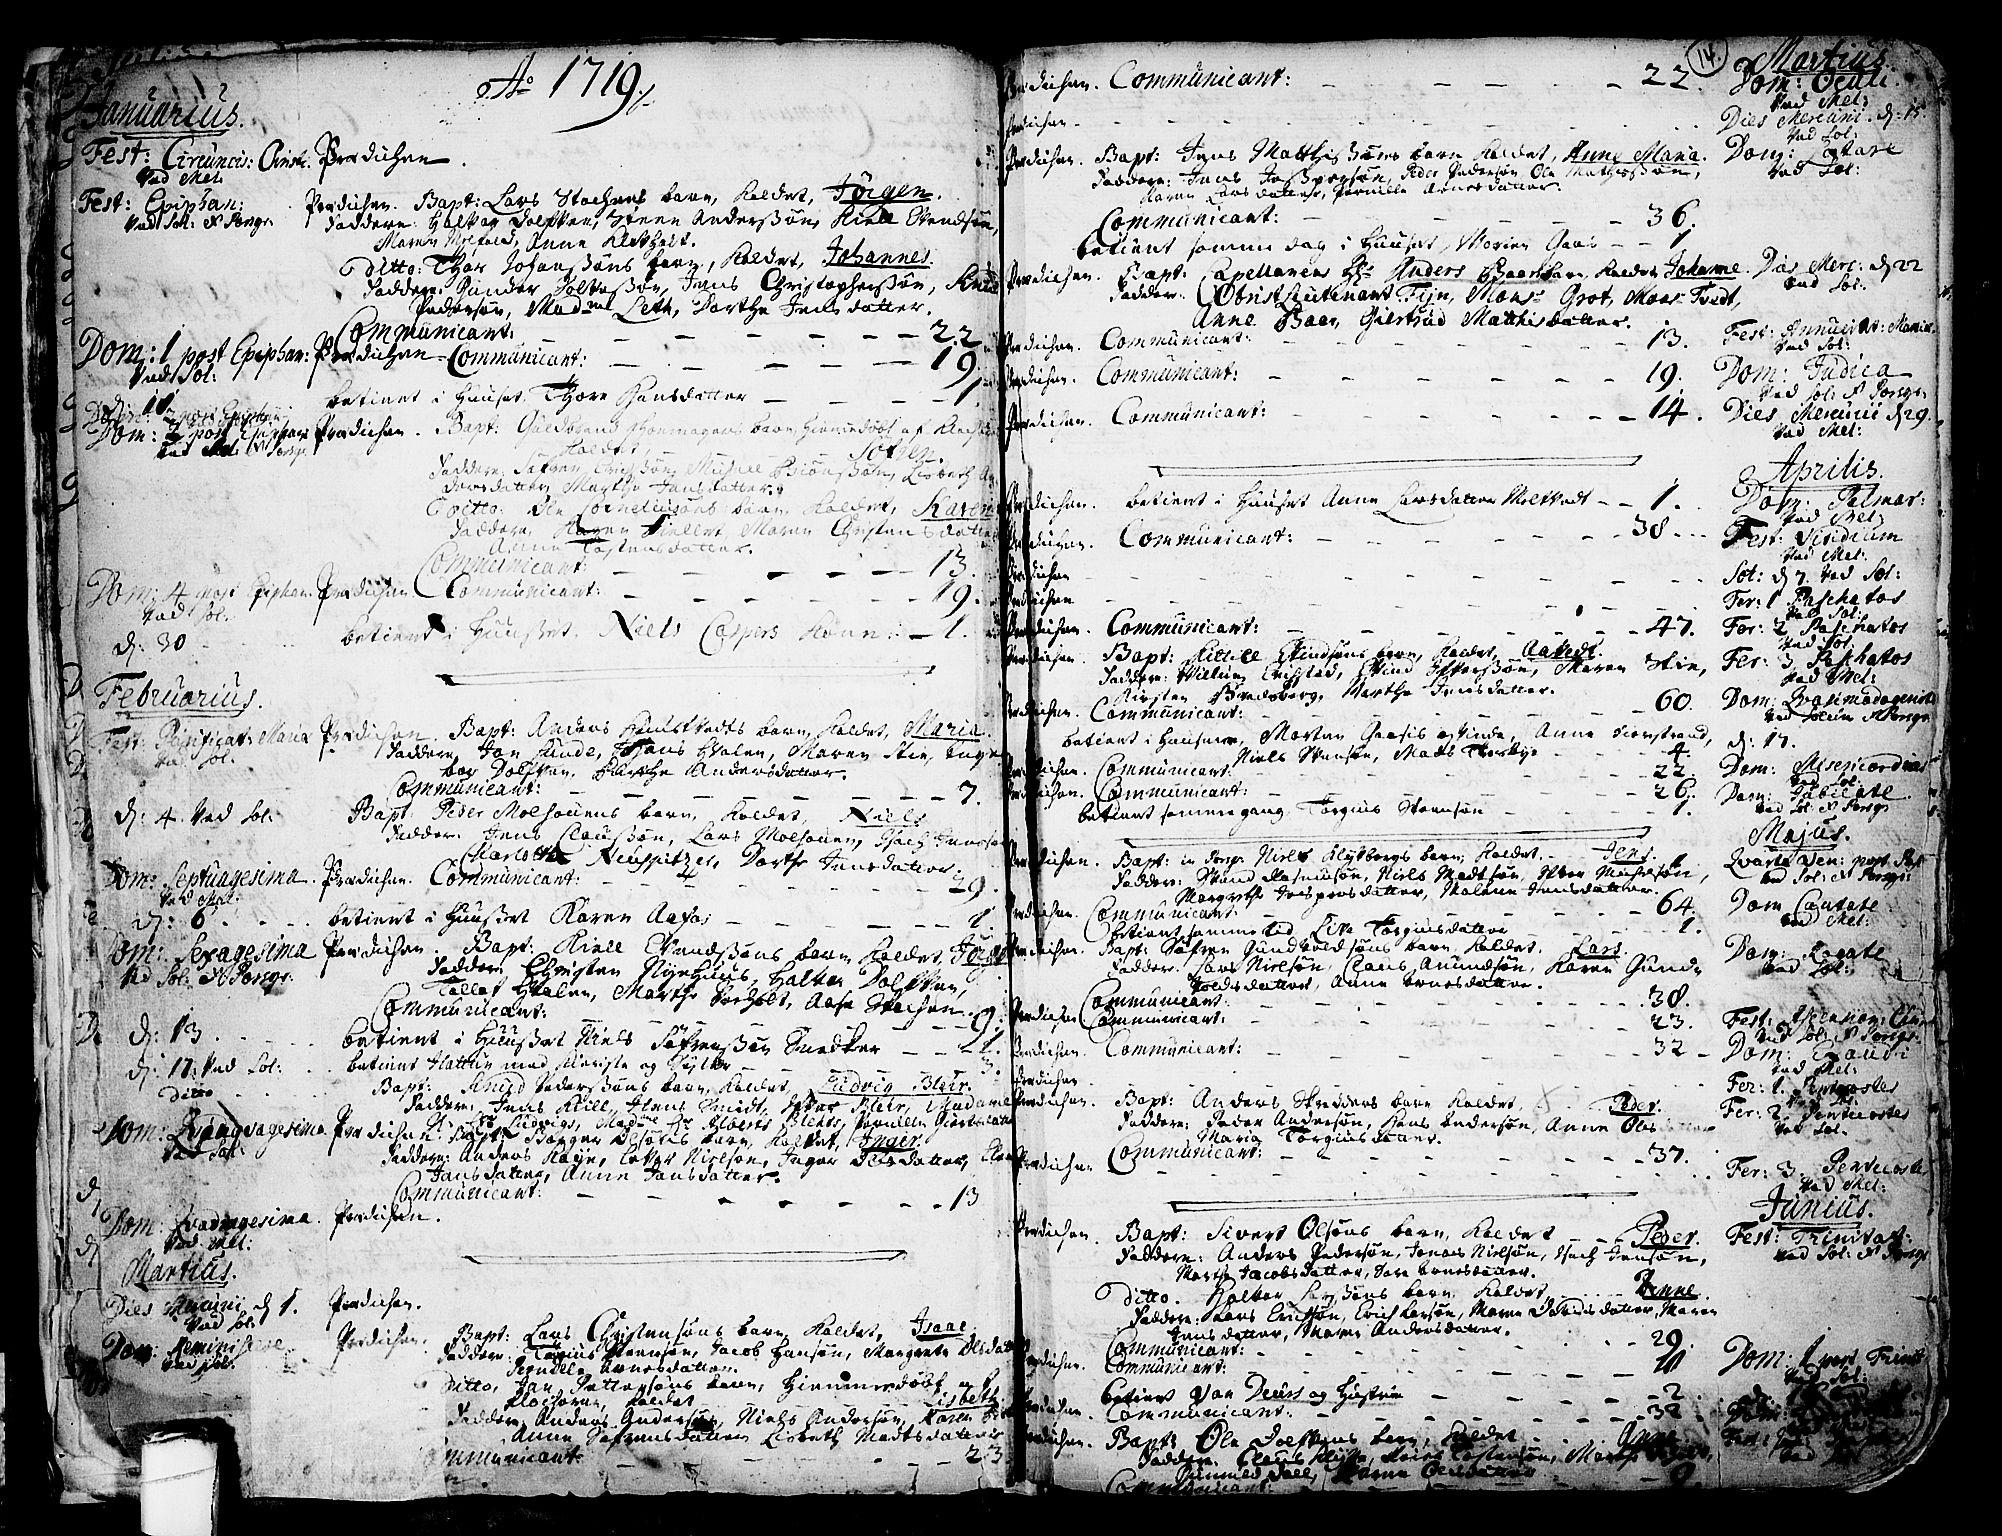 SAKO, Solum kirkebøker, F/Fa/L0002: Ministerialbok nr. I 2, 1713-1761, s. 14